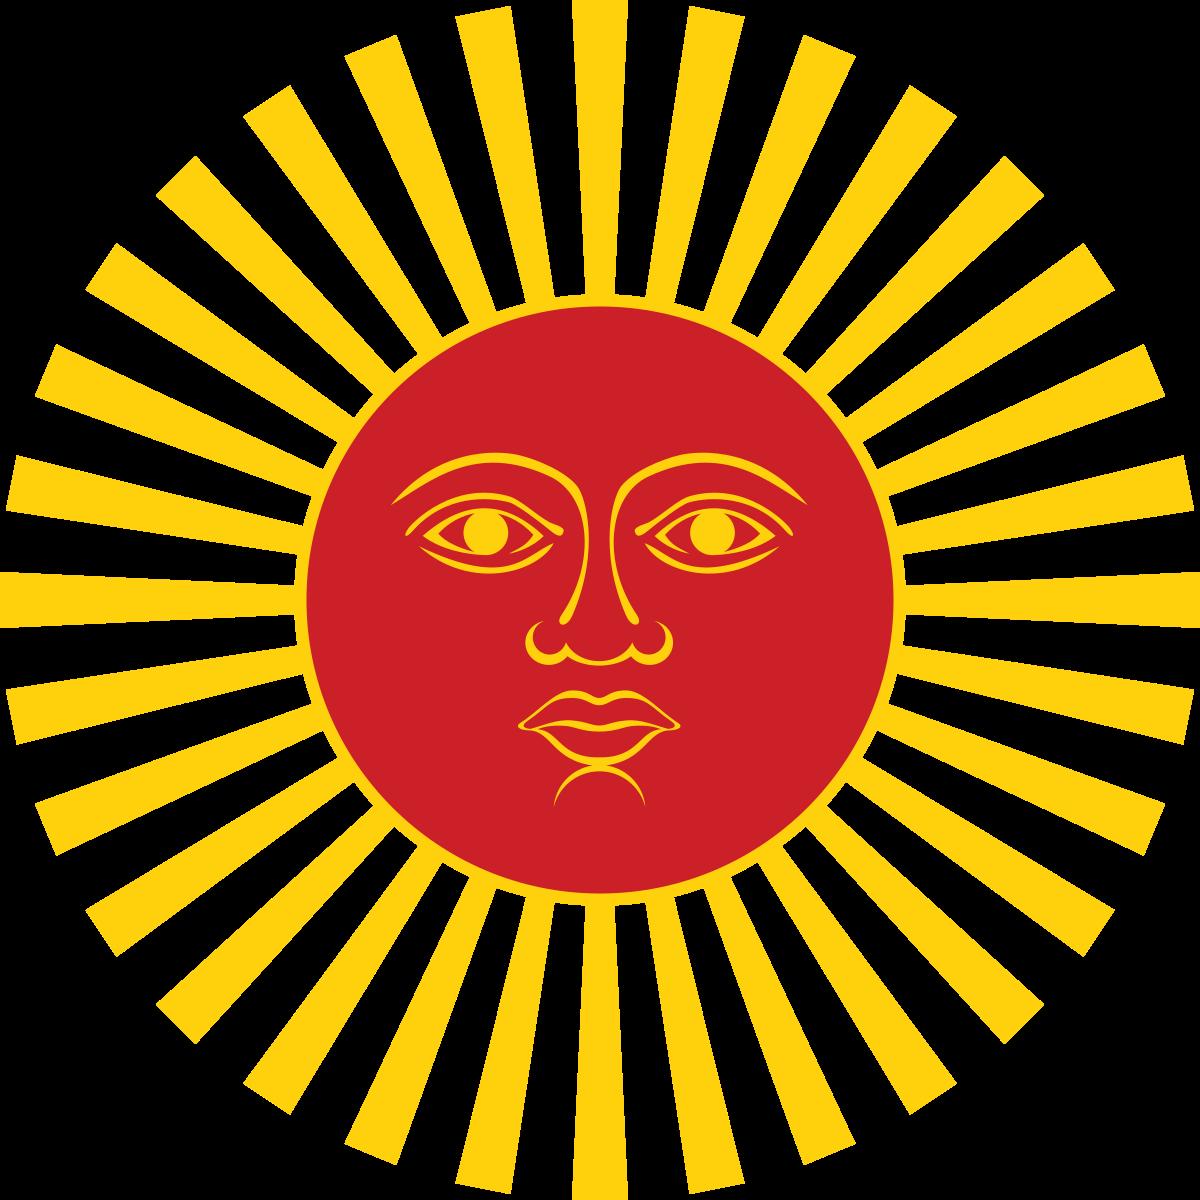 Clipart sun inca. Inti wikipedia